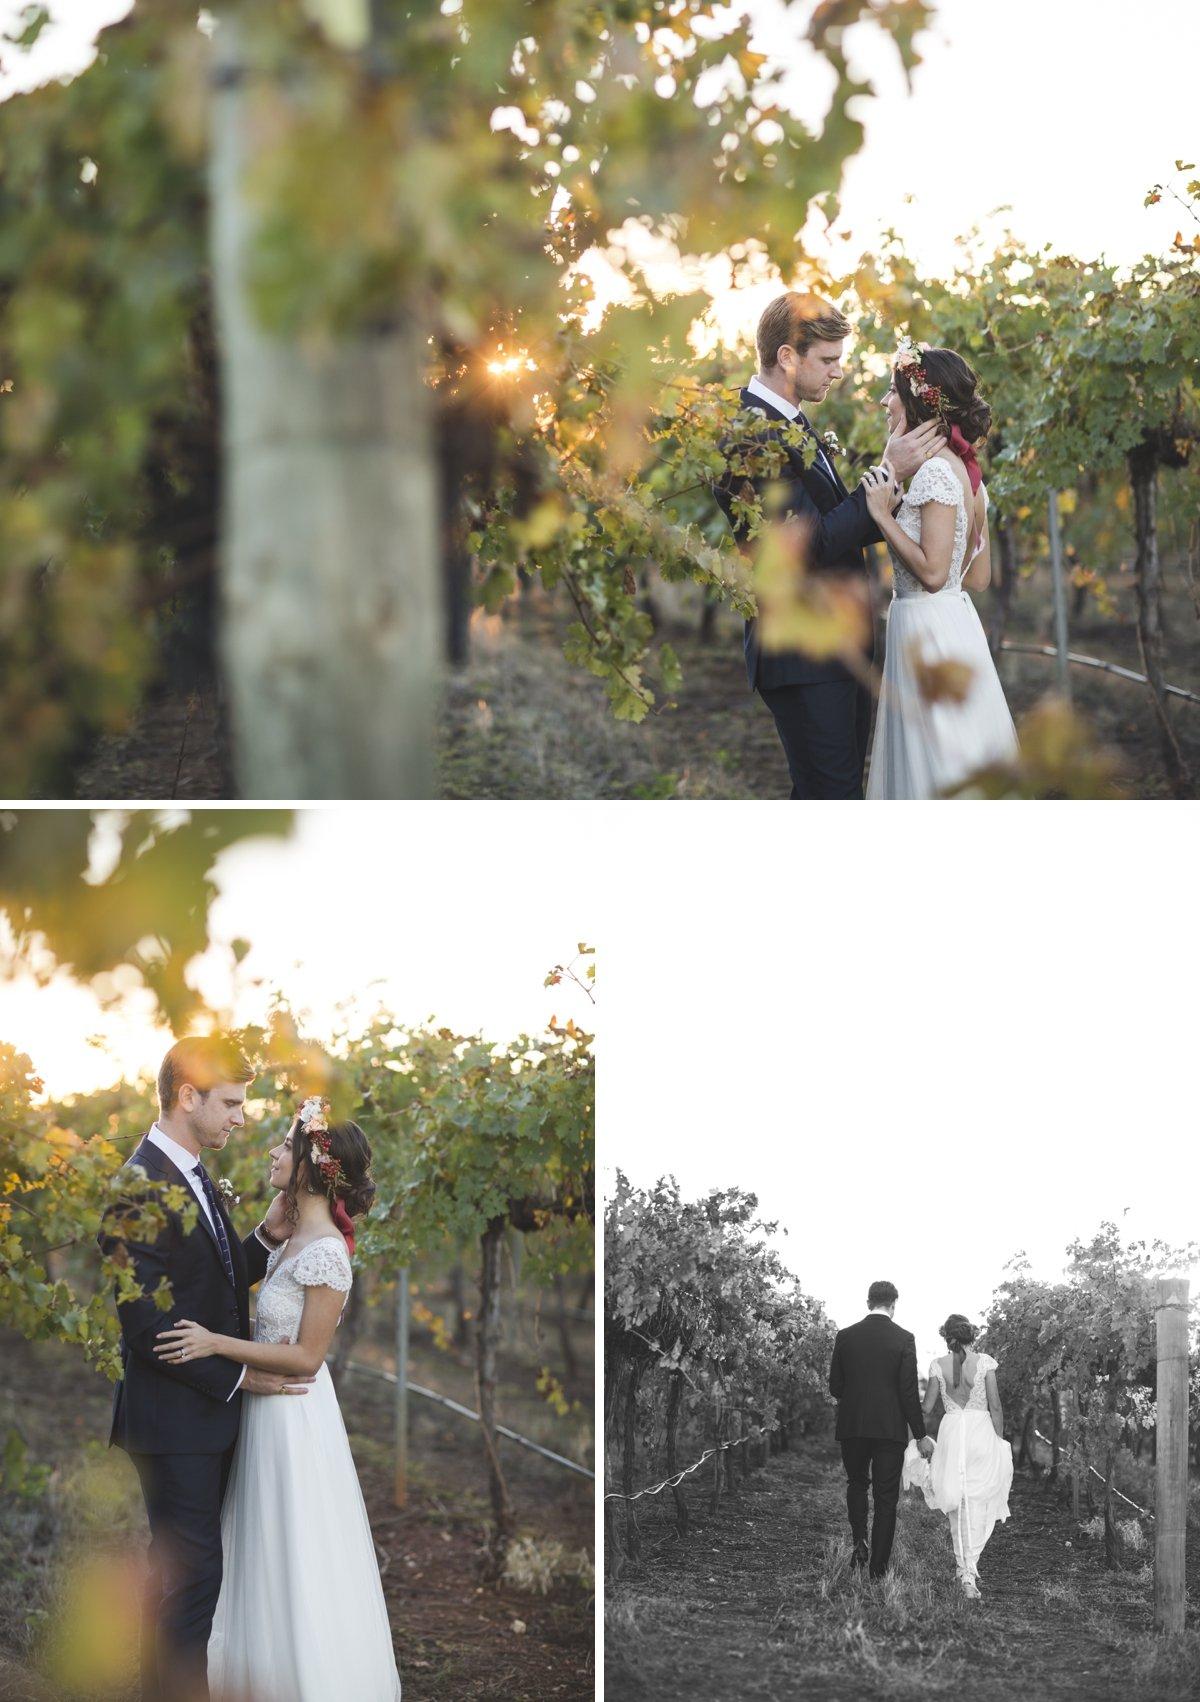 Wagga Wagga Wedding Photographer at Borambola Winery Wagga Wagga Albury wedding photographer Culcairn wedding venue_1136